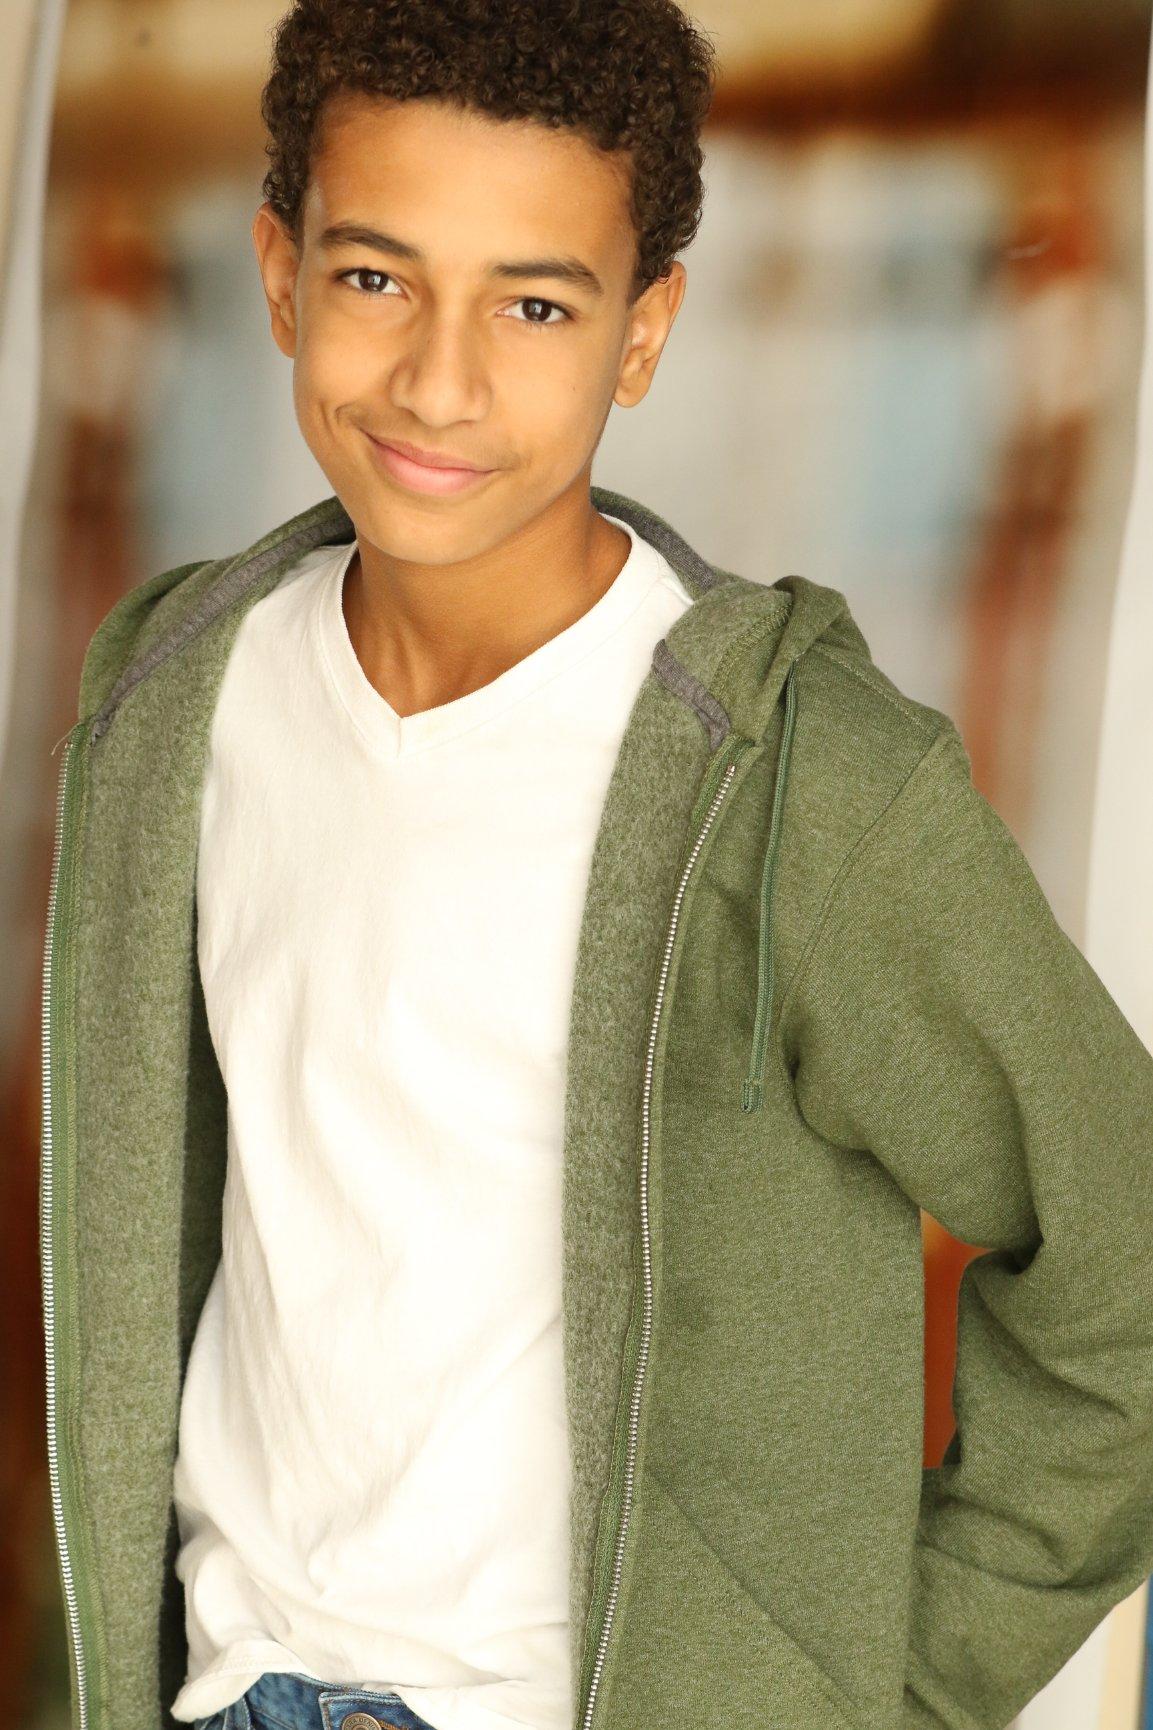 General photo of Tyree Brown